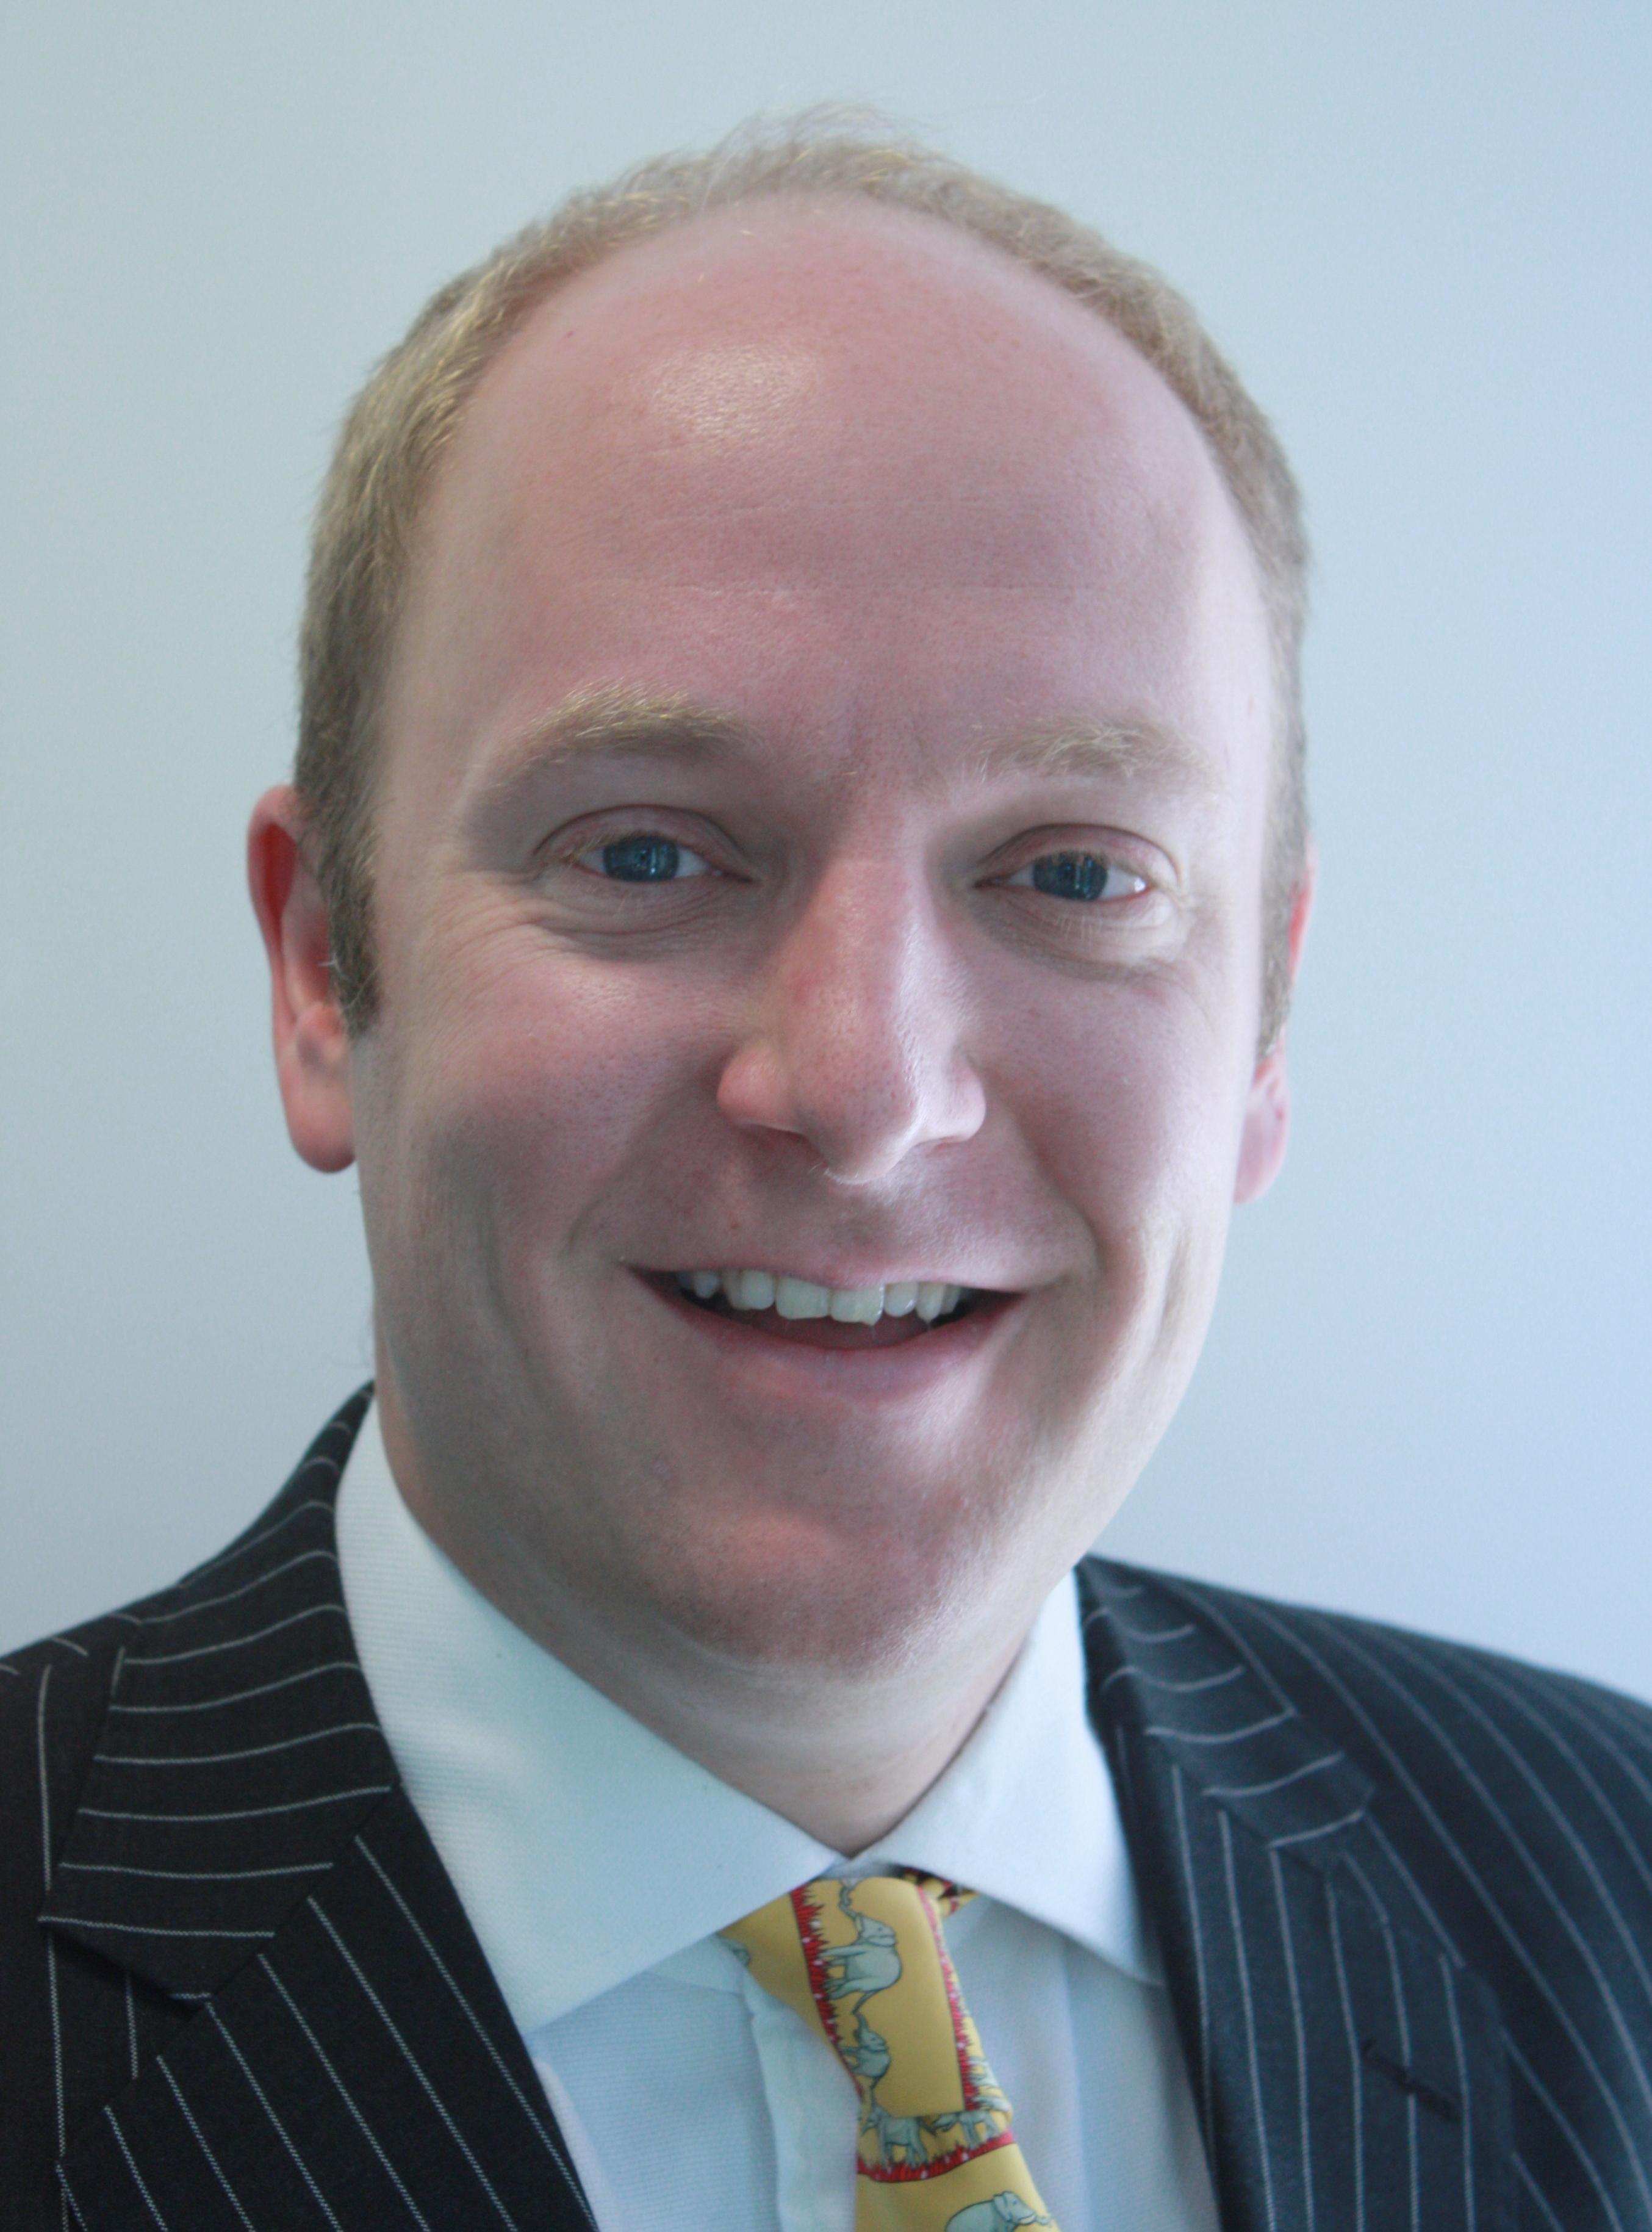 Jonathan Brewer